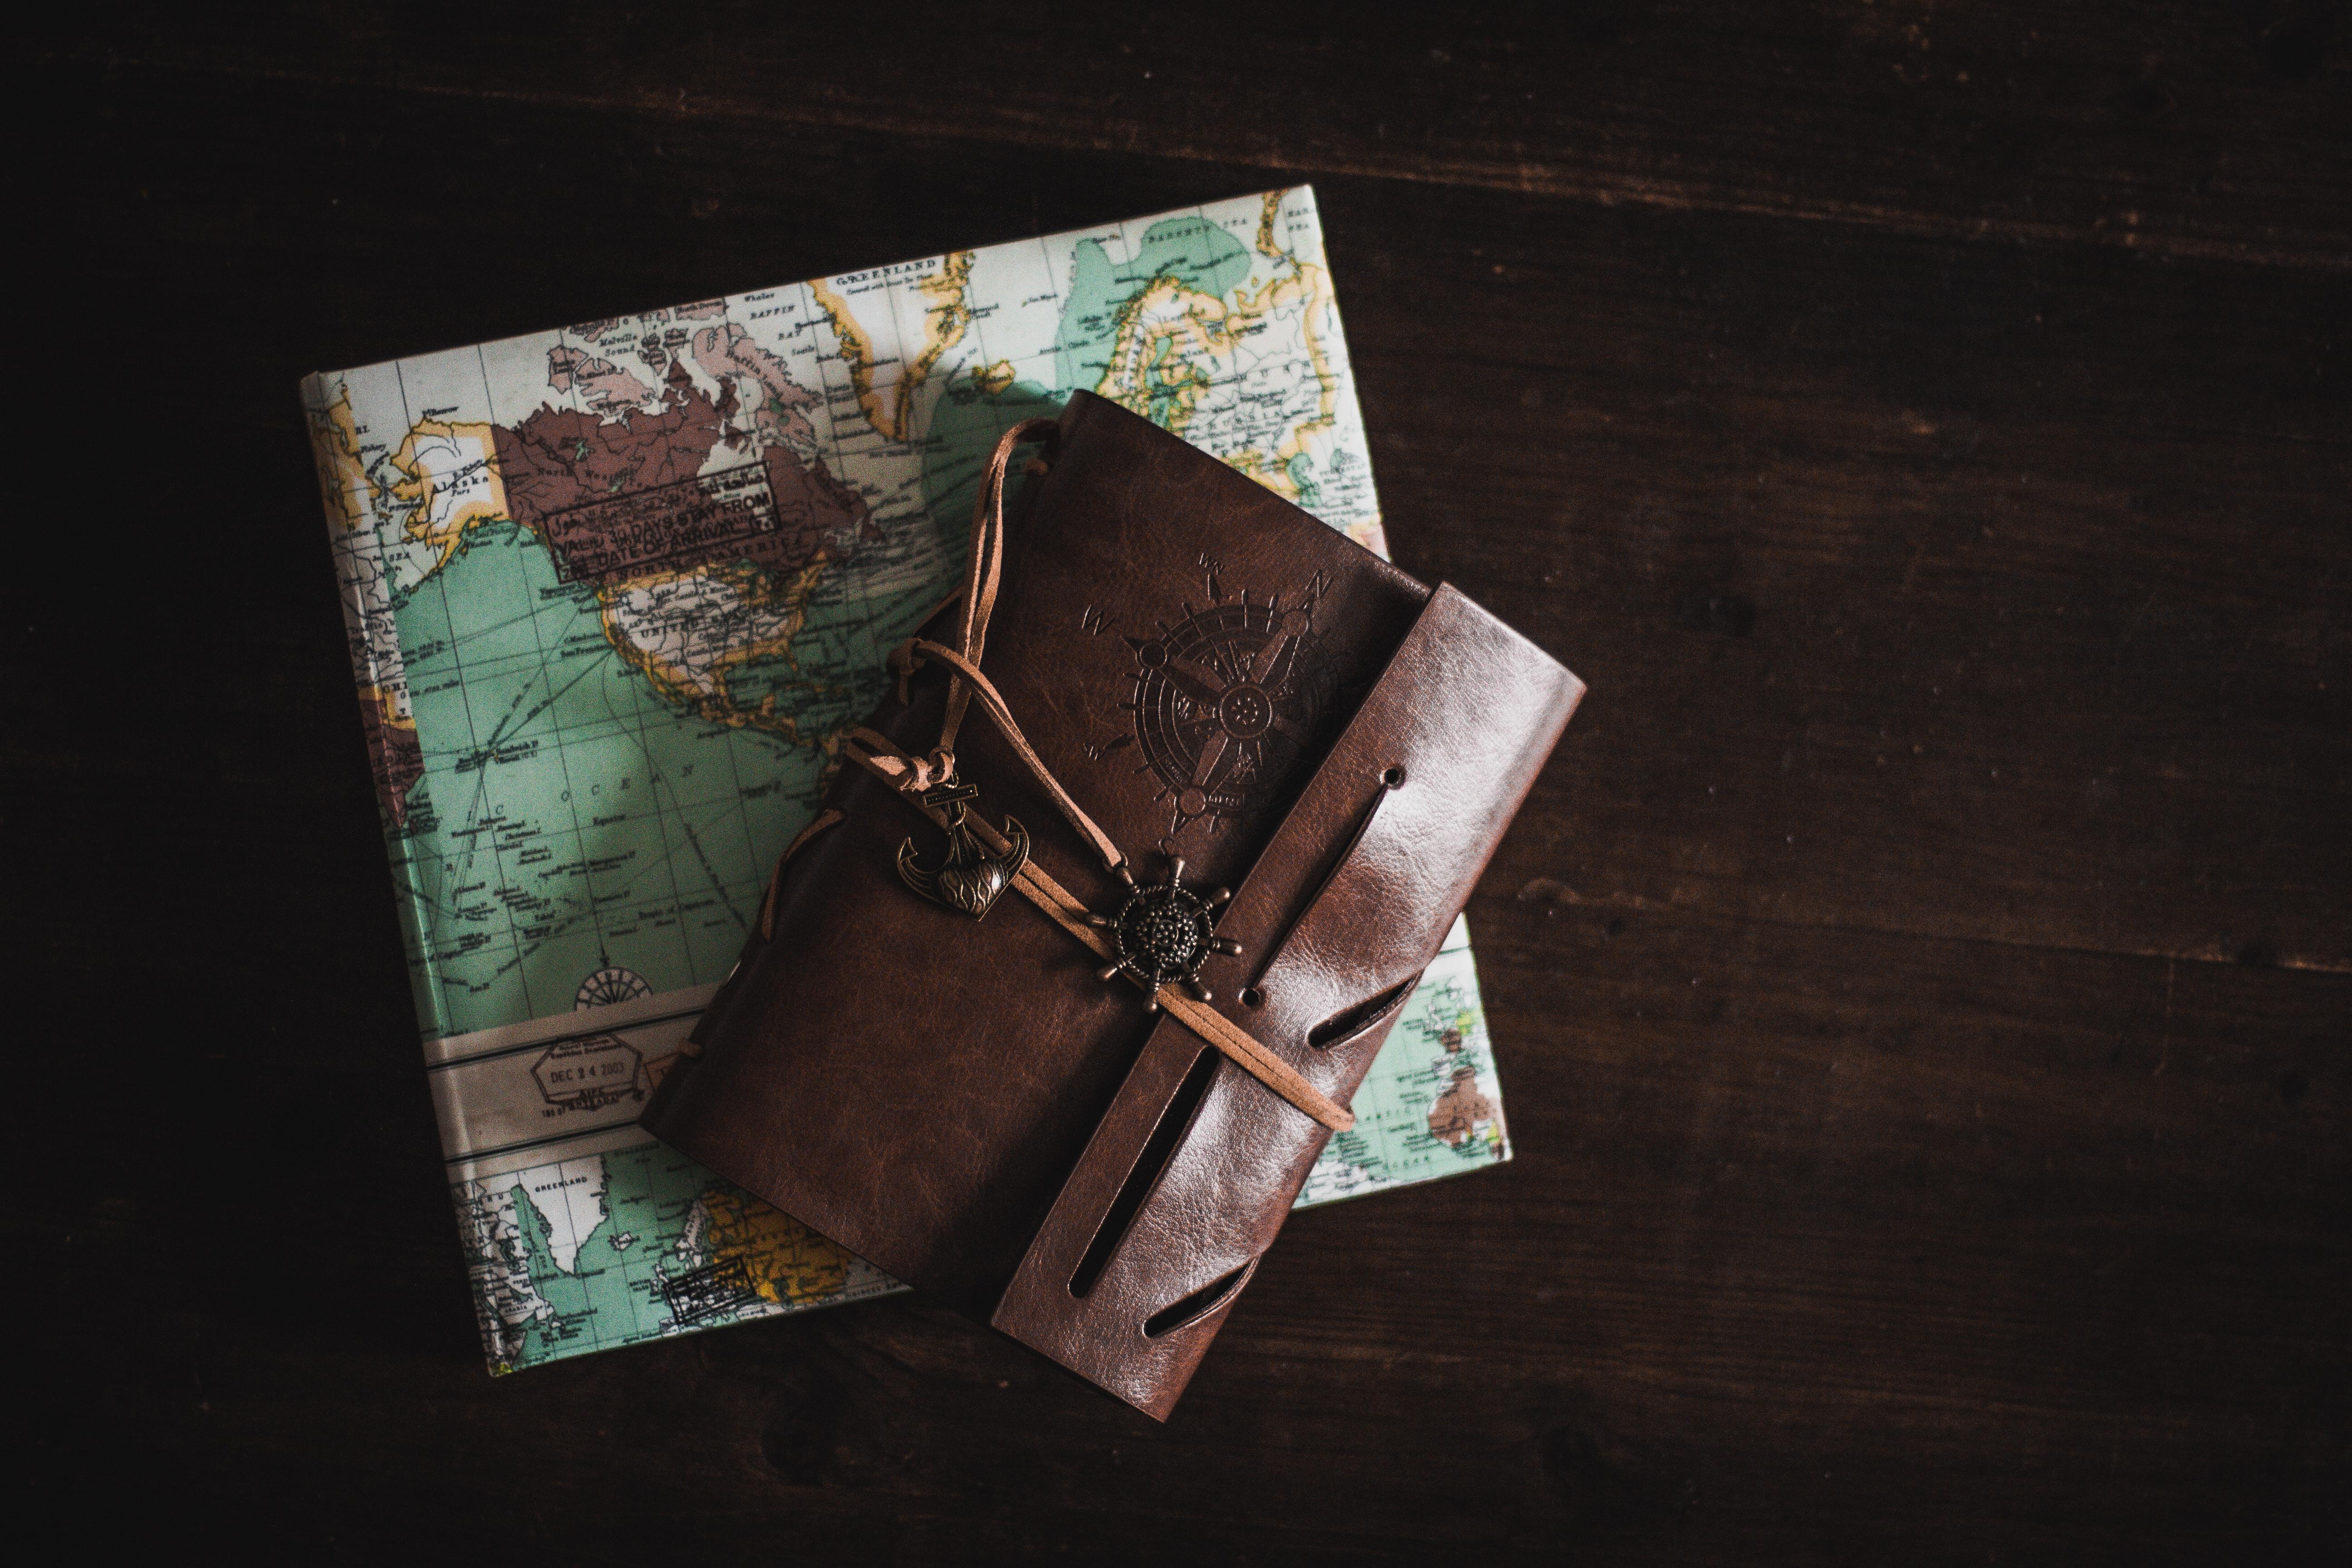 Kiki & Fifi Traveling Through Books Episode 7